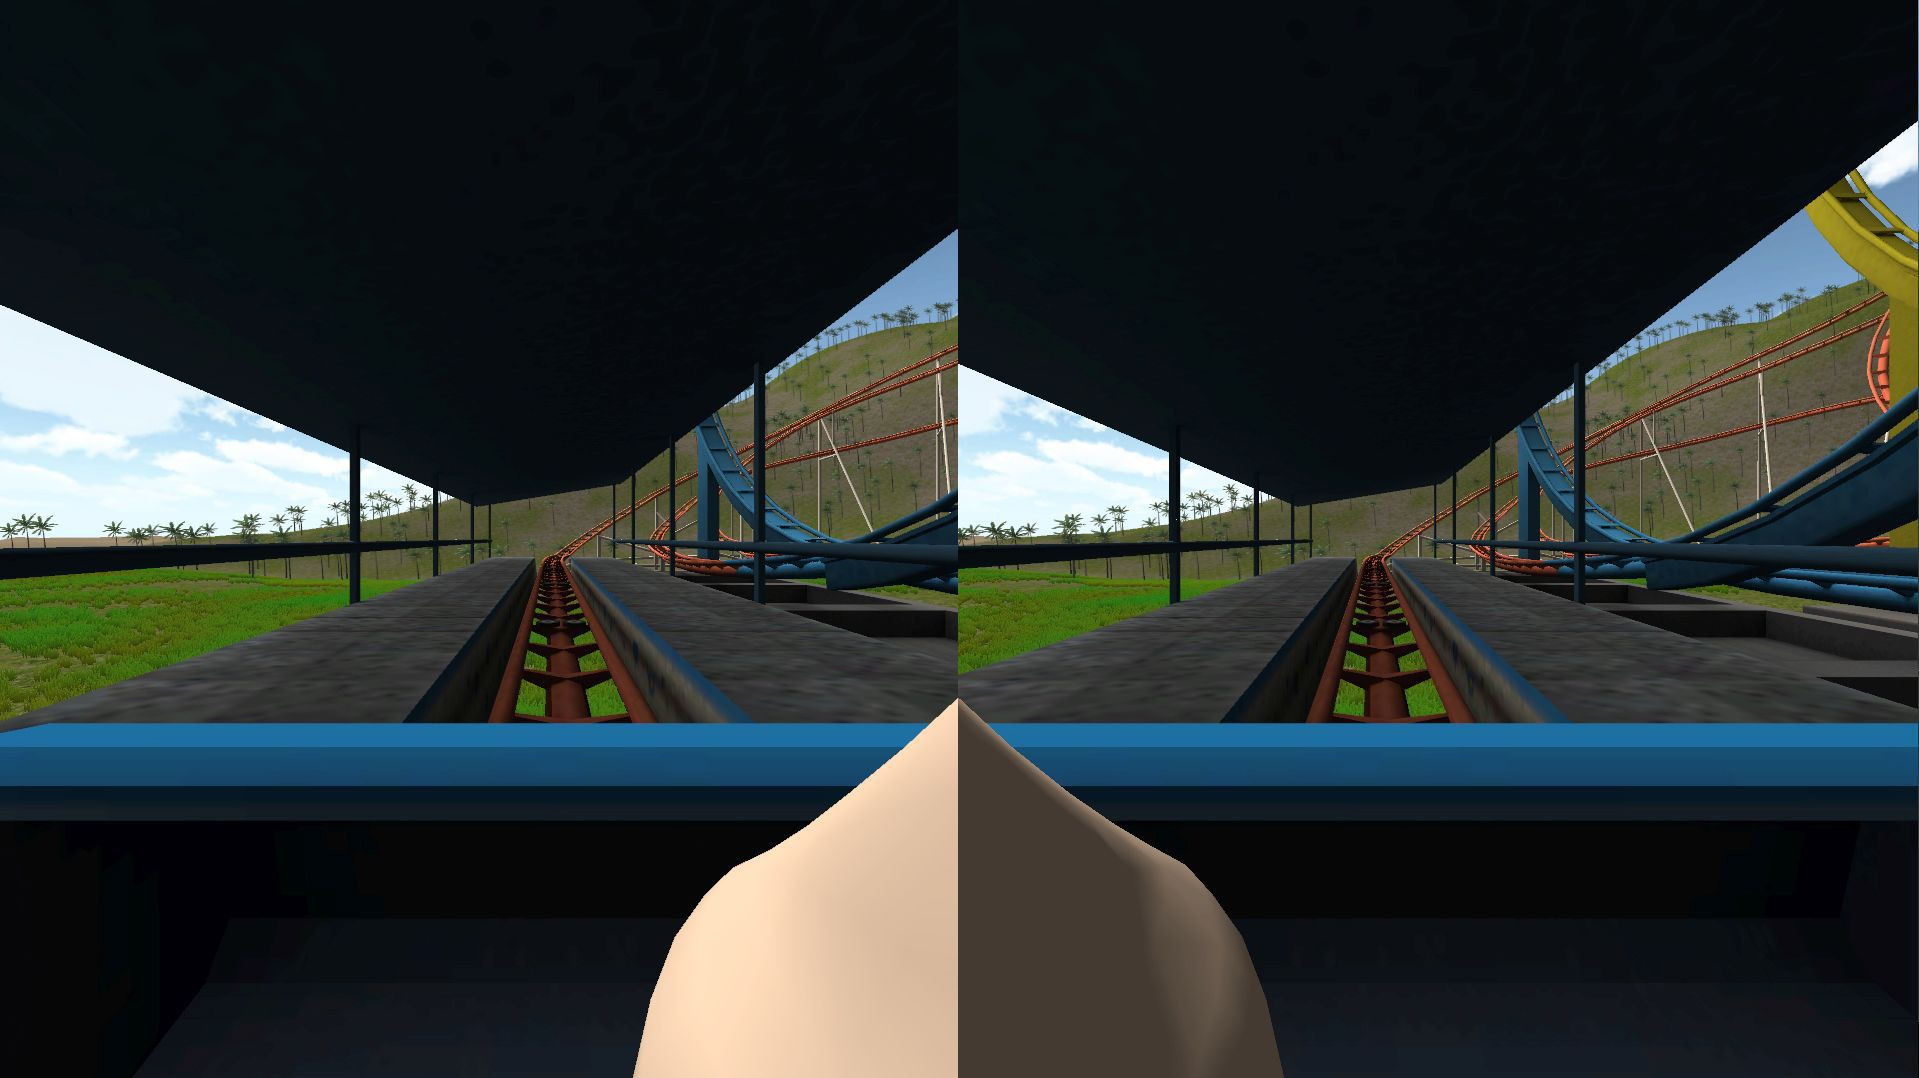 Forscher: Virtuelle Nase gegen Übelkeit bei Virtual Reality